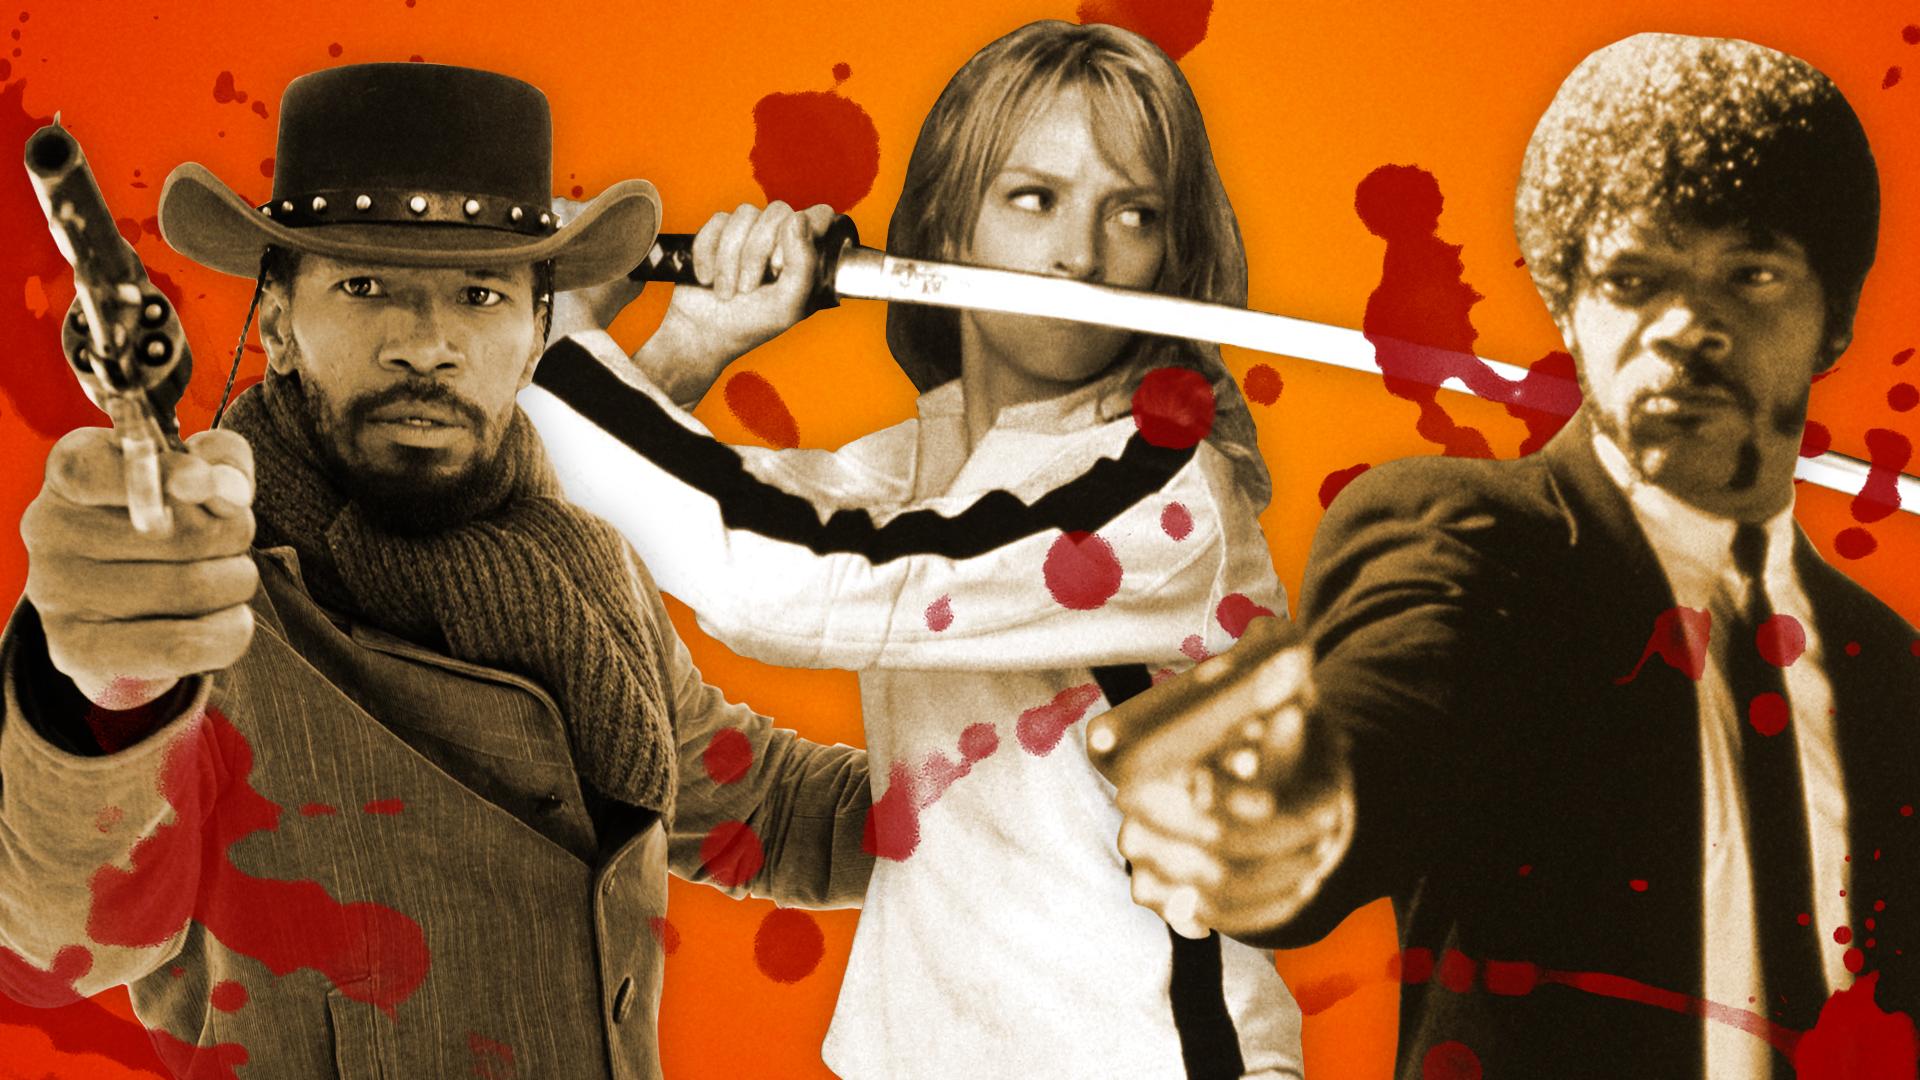 Quentin Tarantino movie